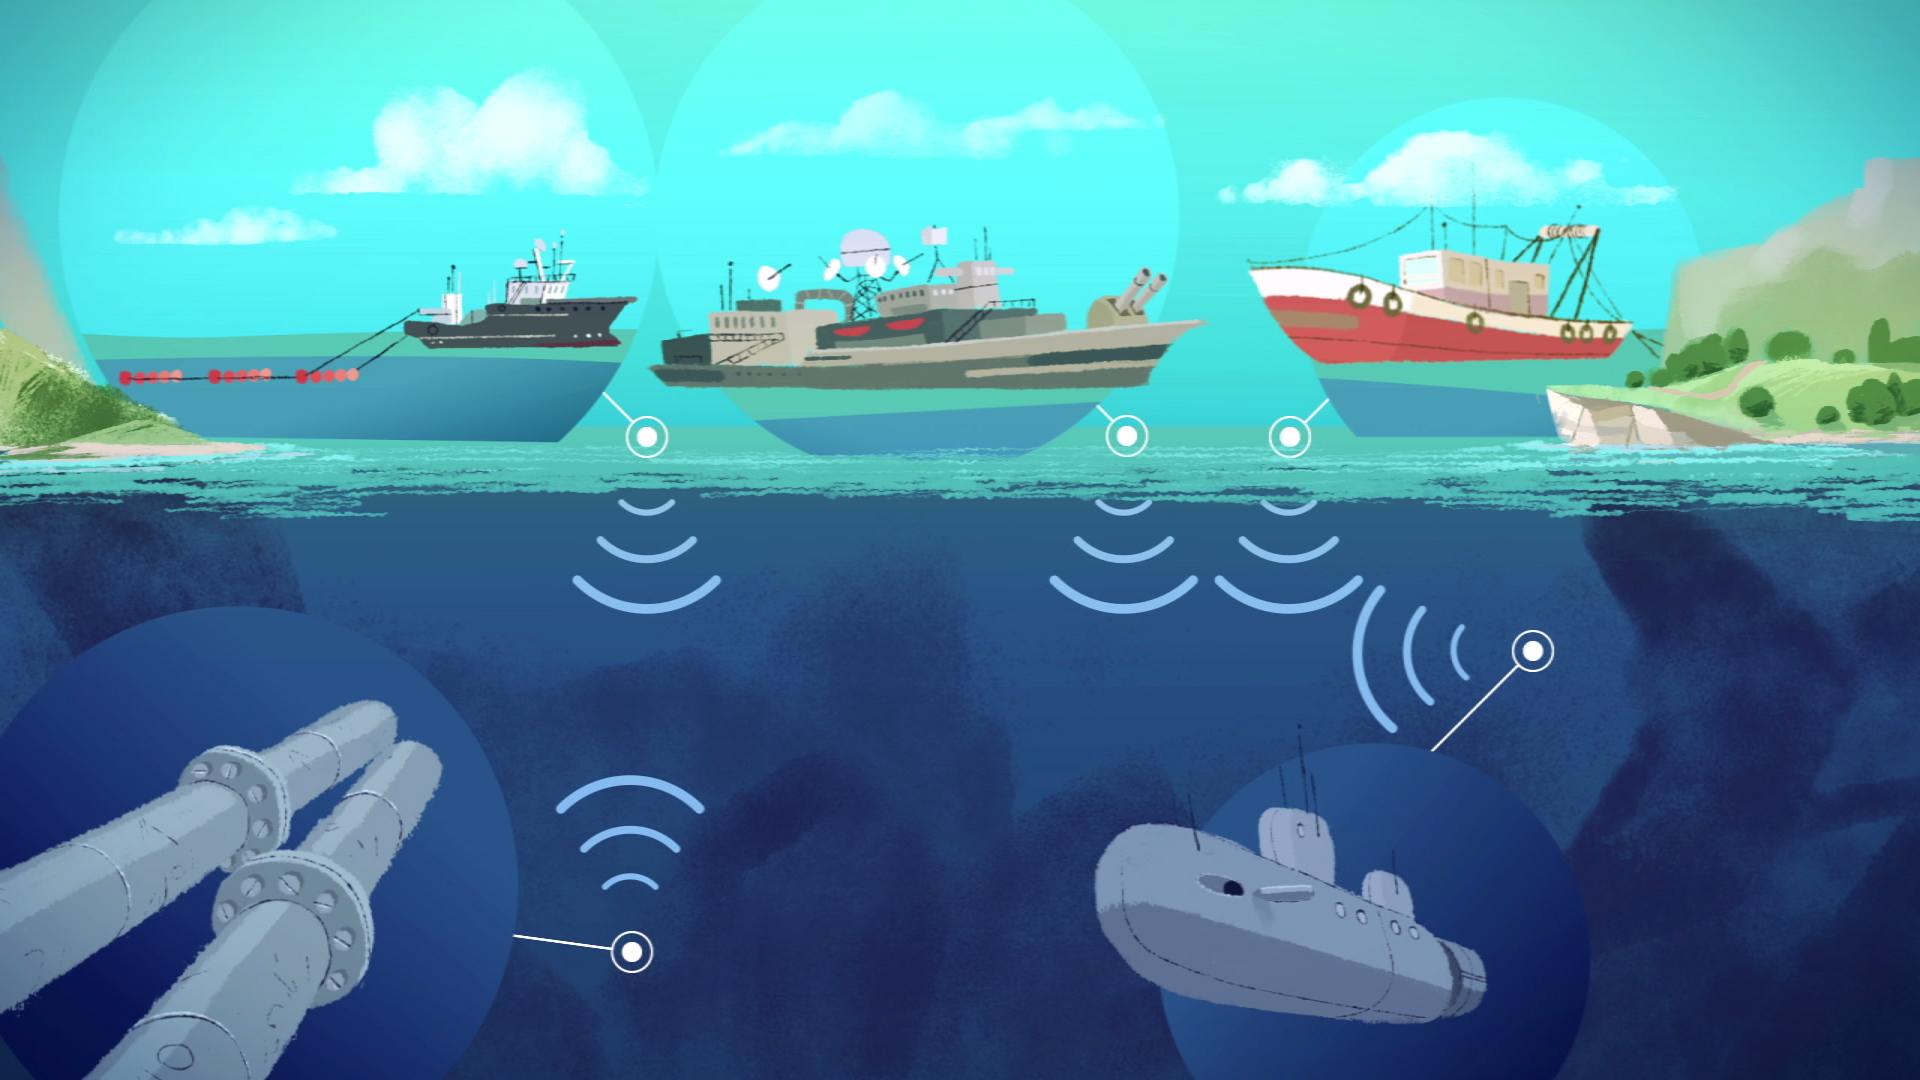 Ocean noise & whales